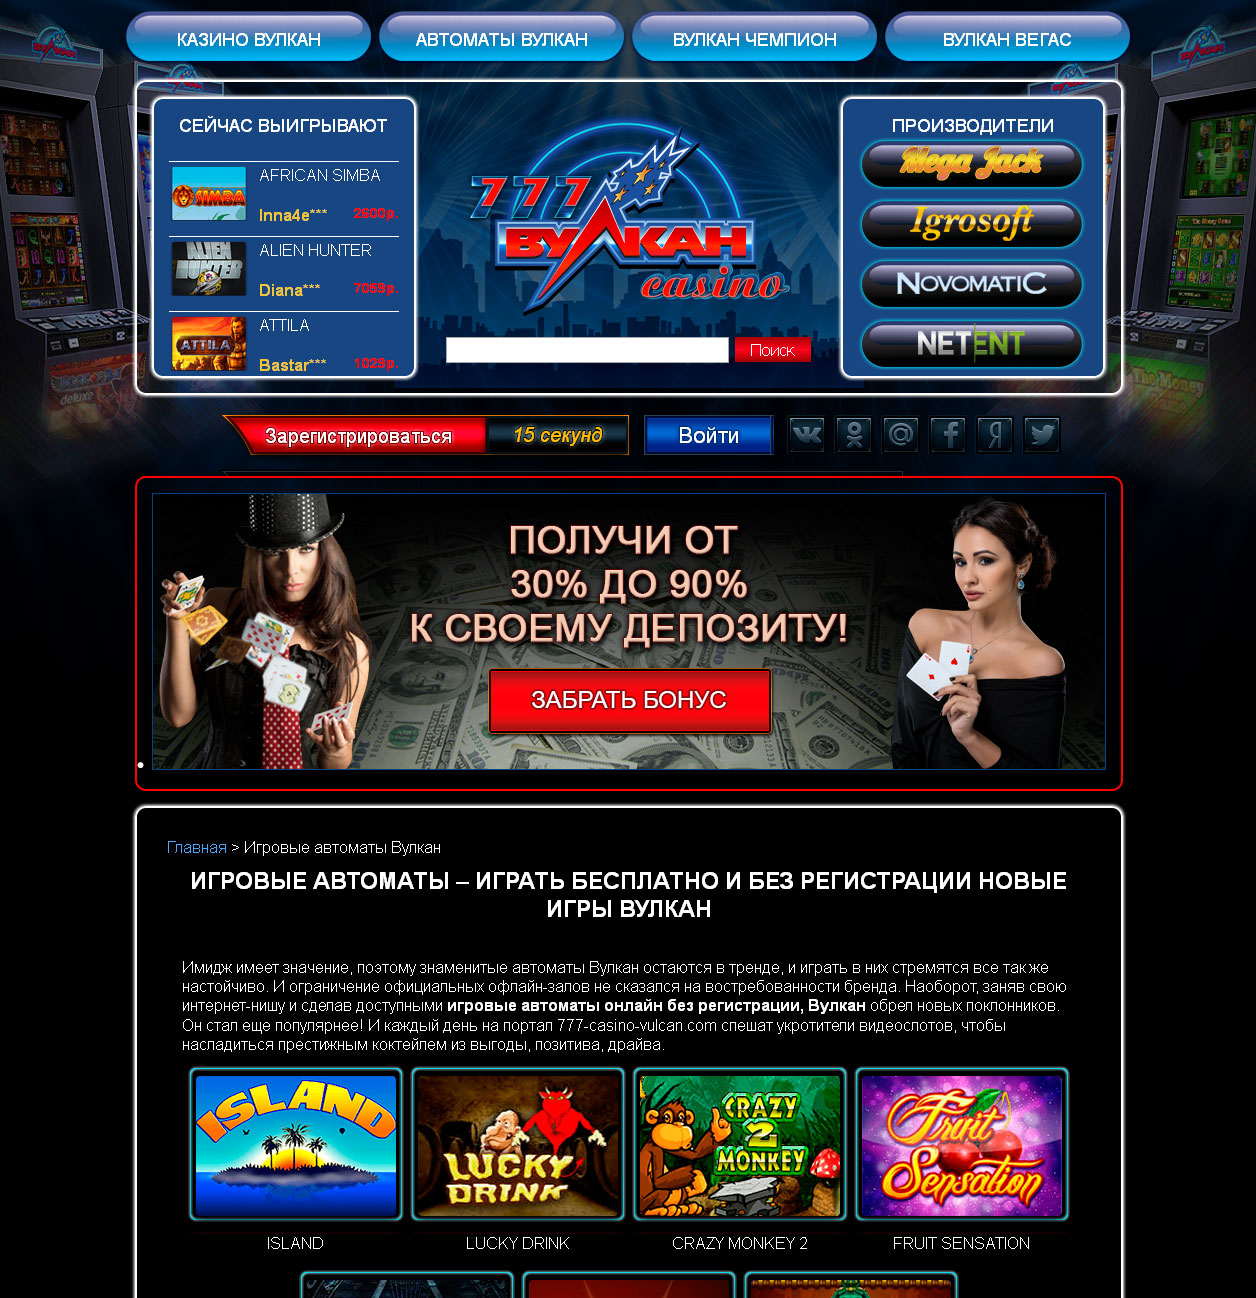 vulcan casino online com